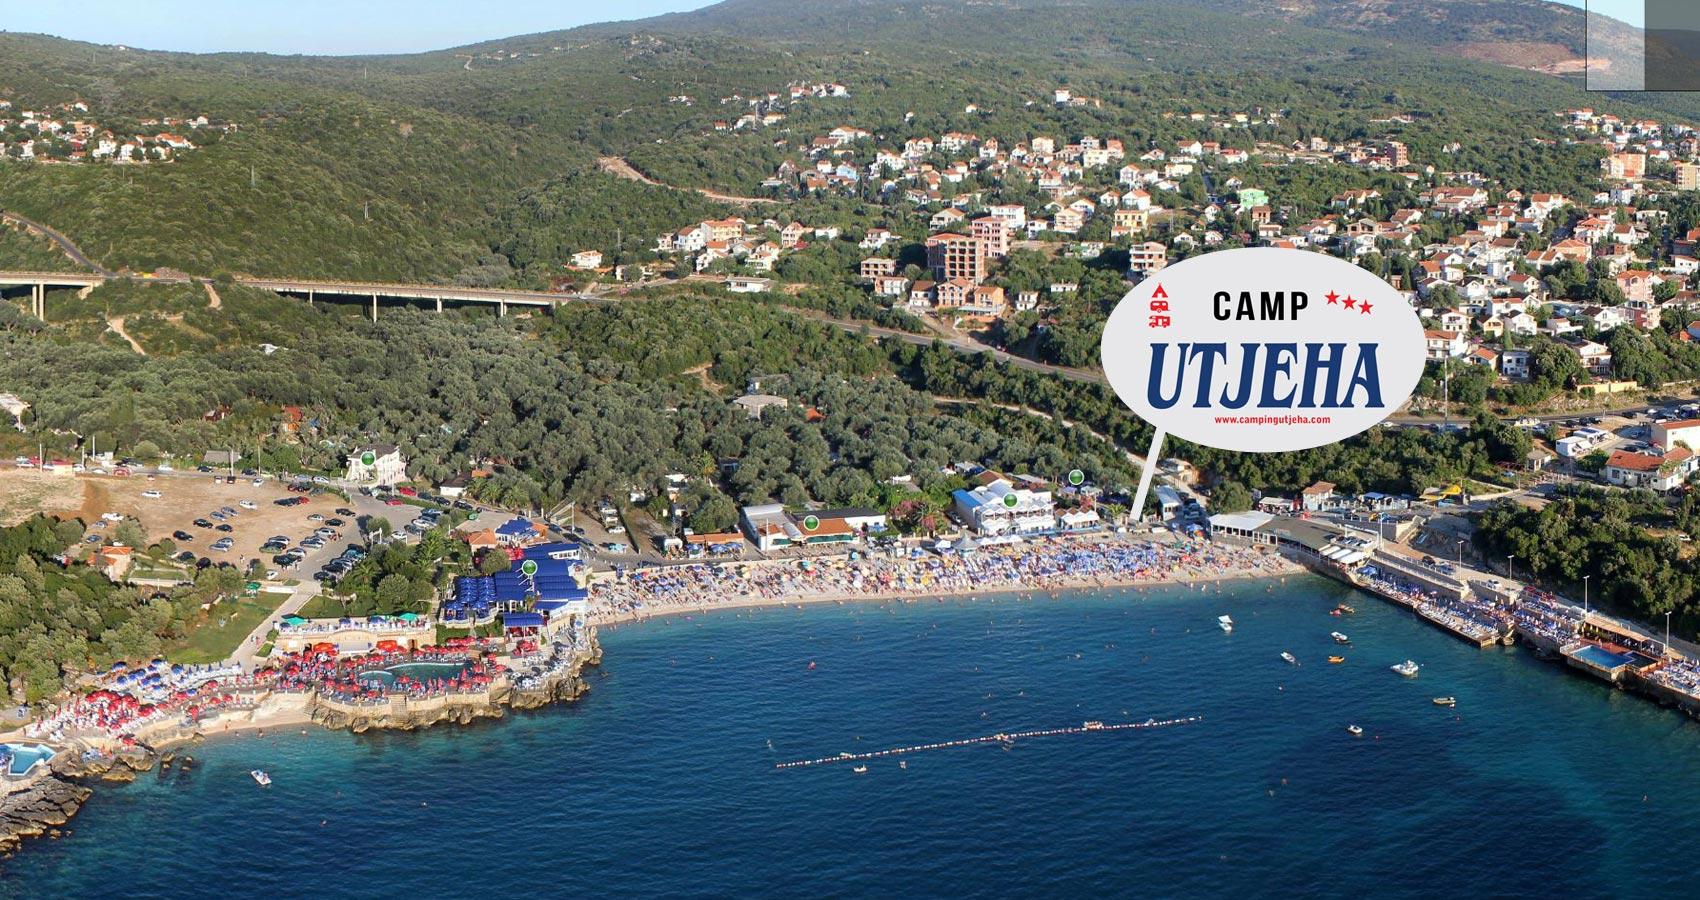 Auto Kamp Utjeha Camping Utjeha Camping Montenegro Kamping